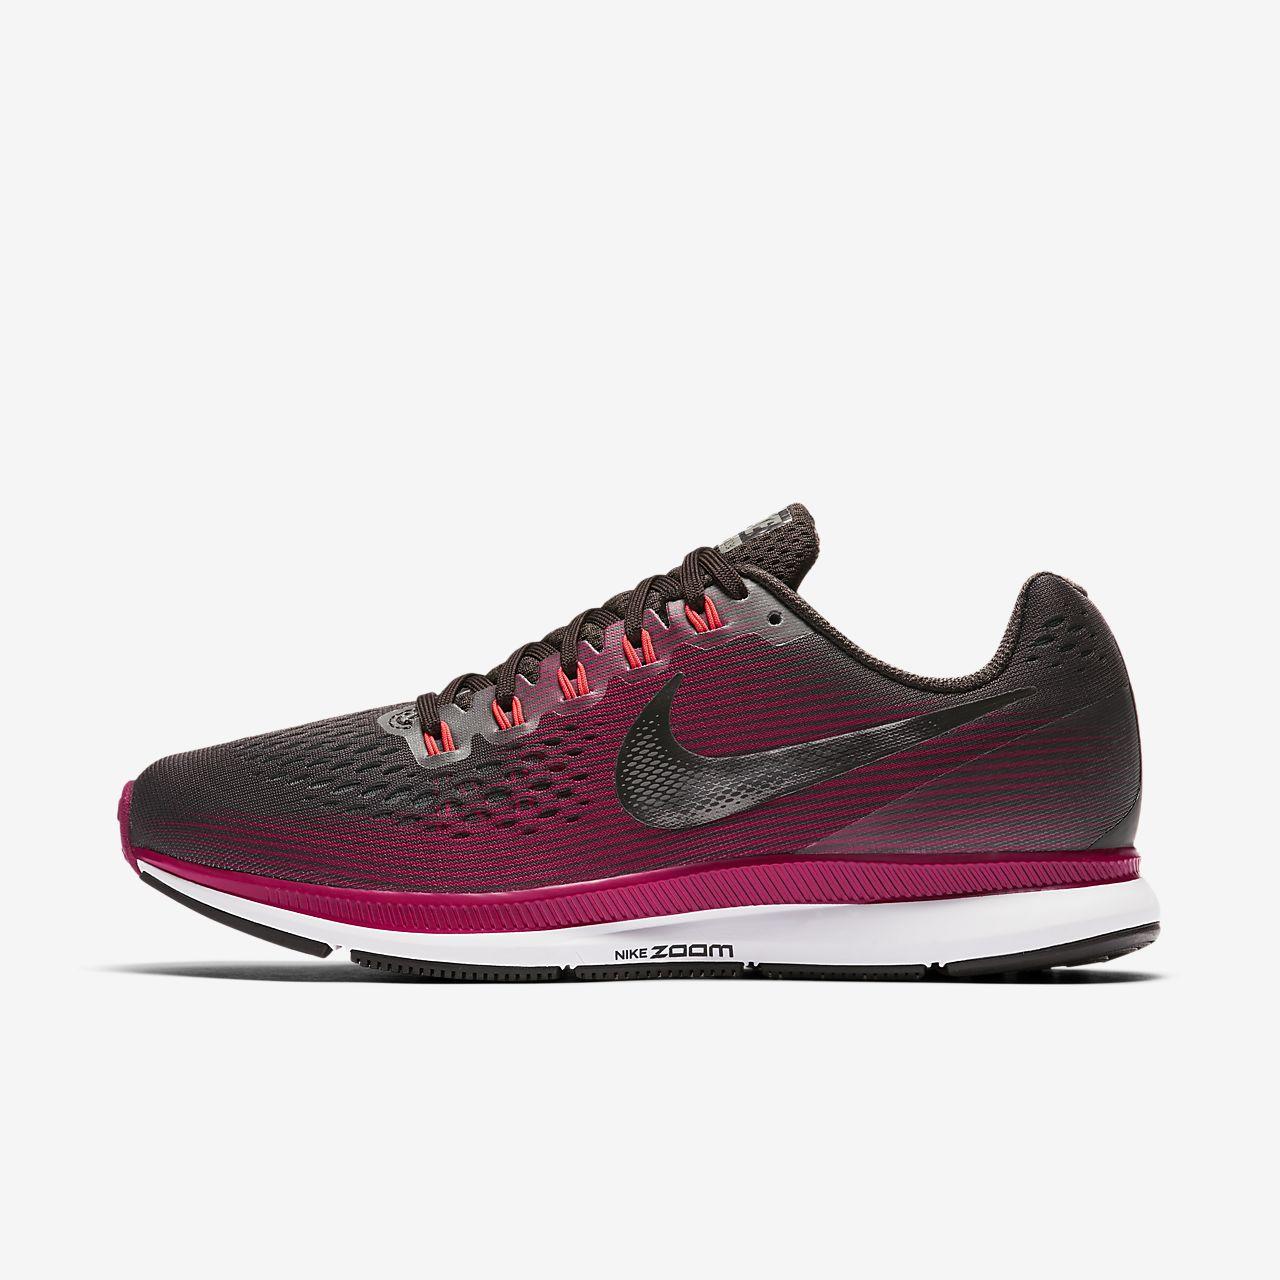 ... Nike Air Zoom Pegasus 34 Gem - løbesko til kvinder